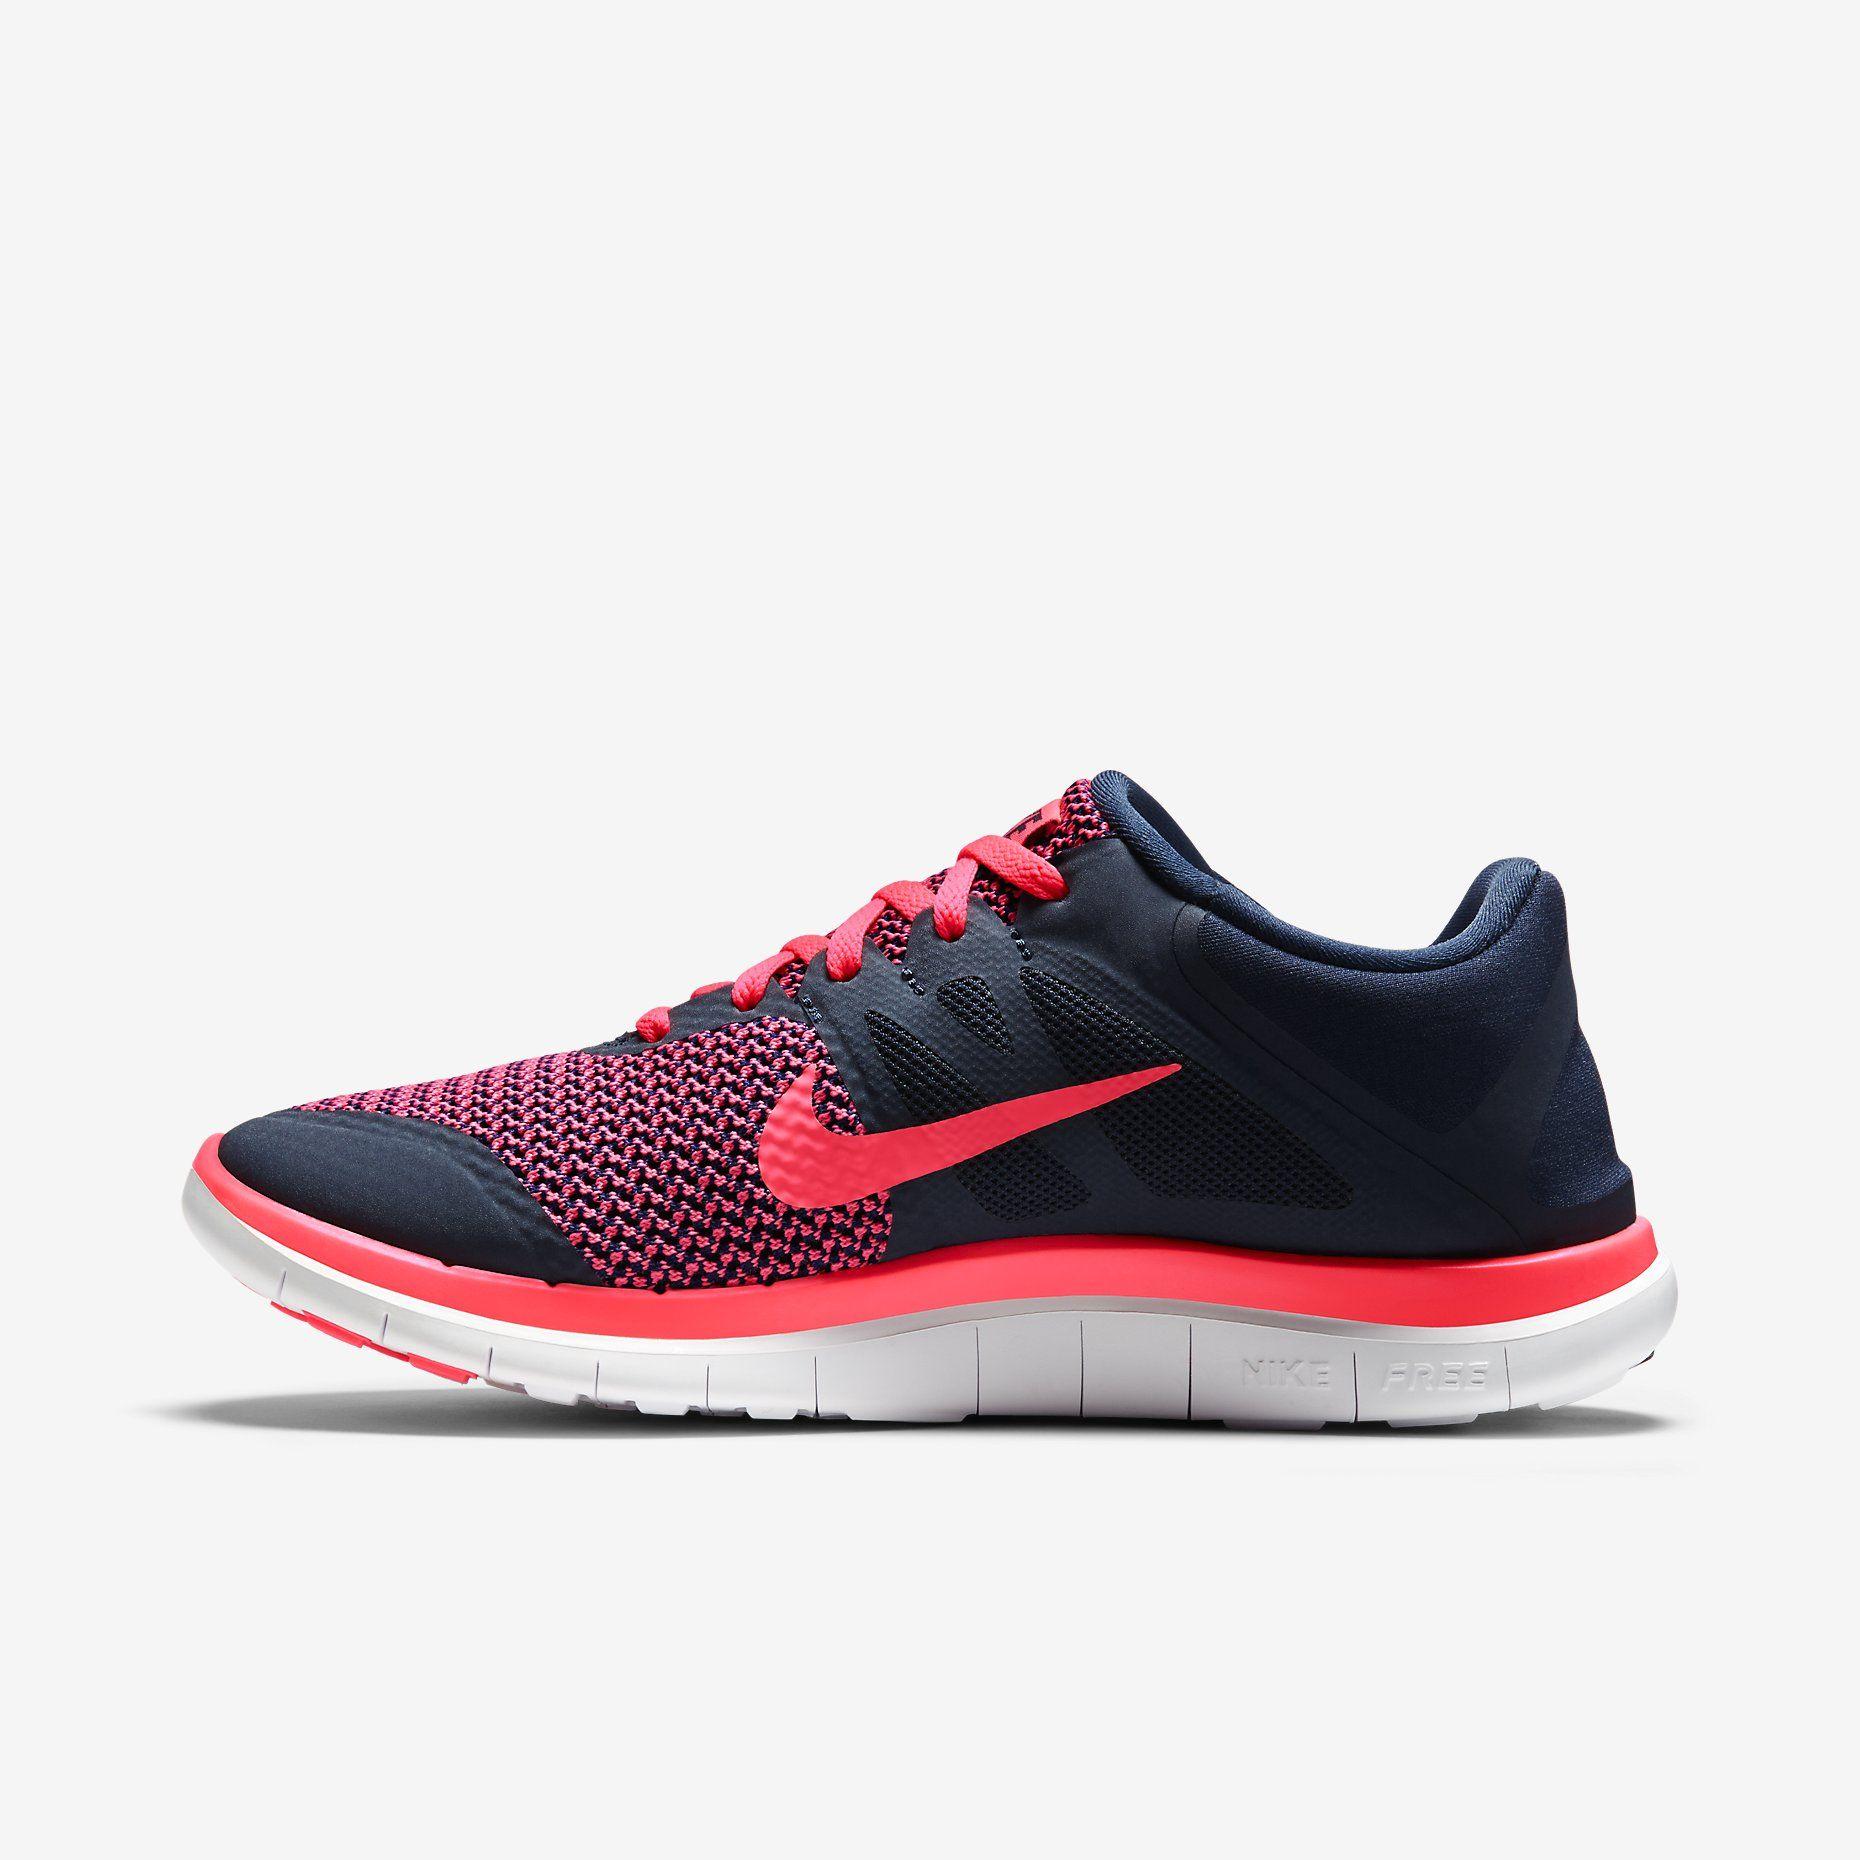 huge selection of 58b88 5d535 Nike Free 4.0 Women s Running Shoe.